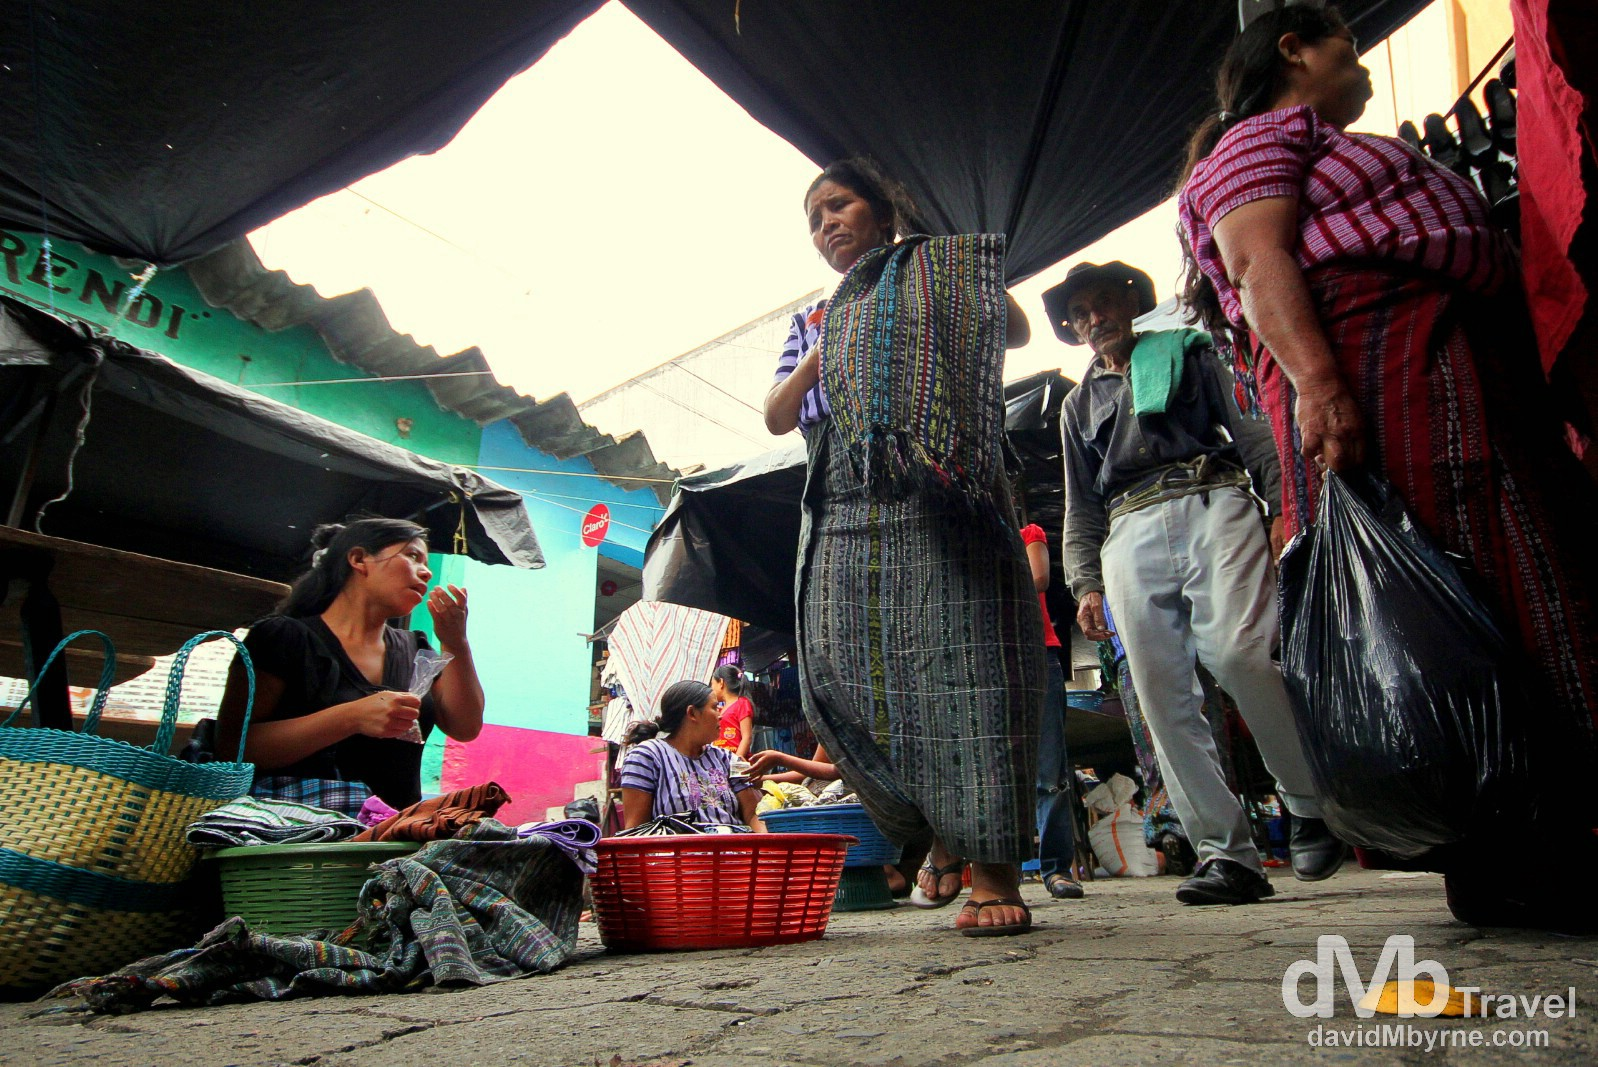 Market day in Santiago Atitlan, Guatemala. May 24th 2013.